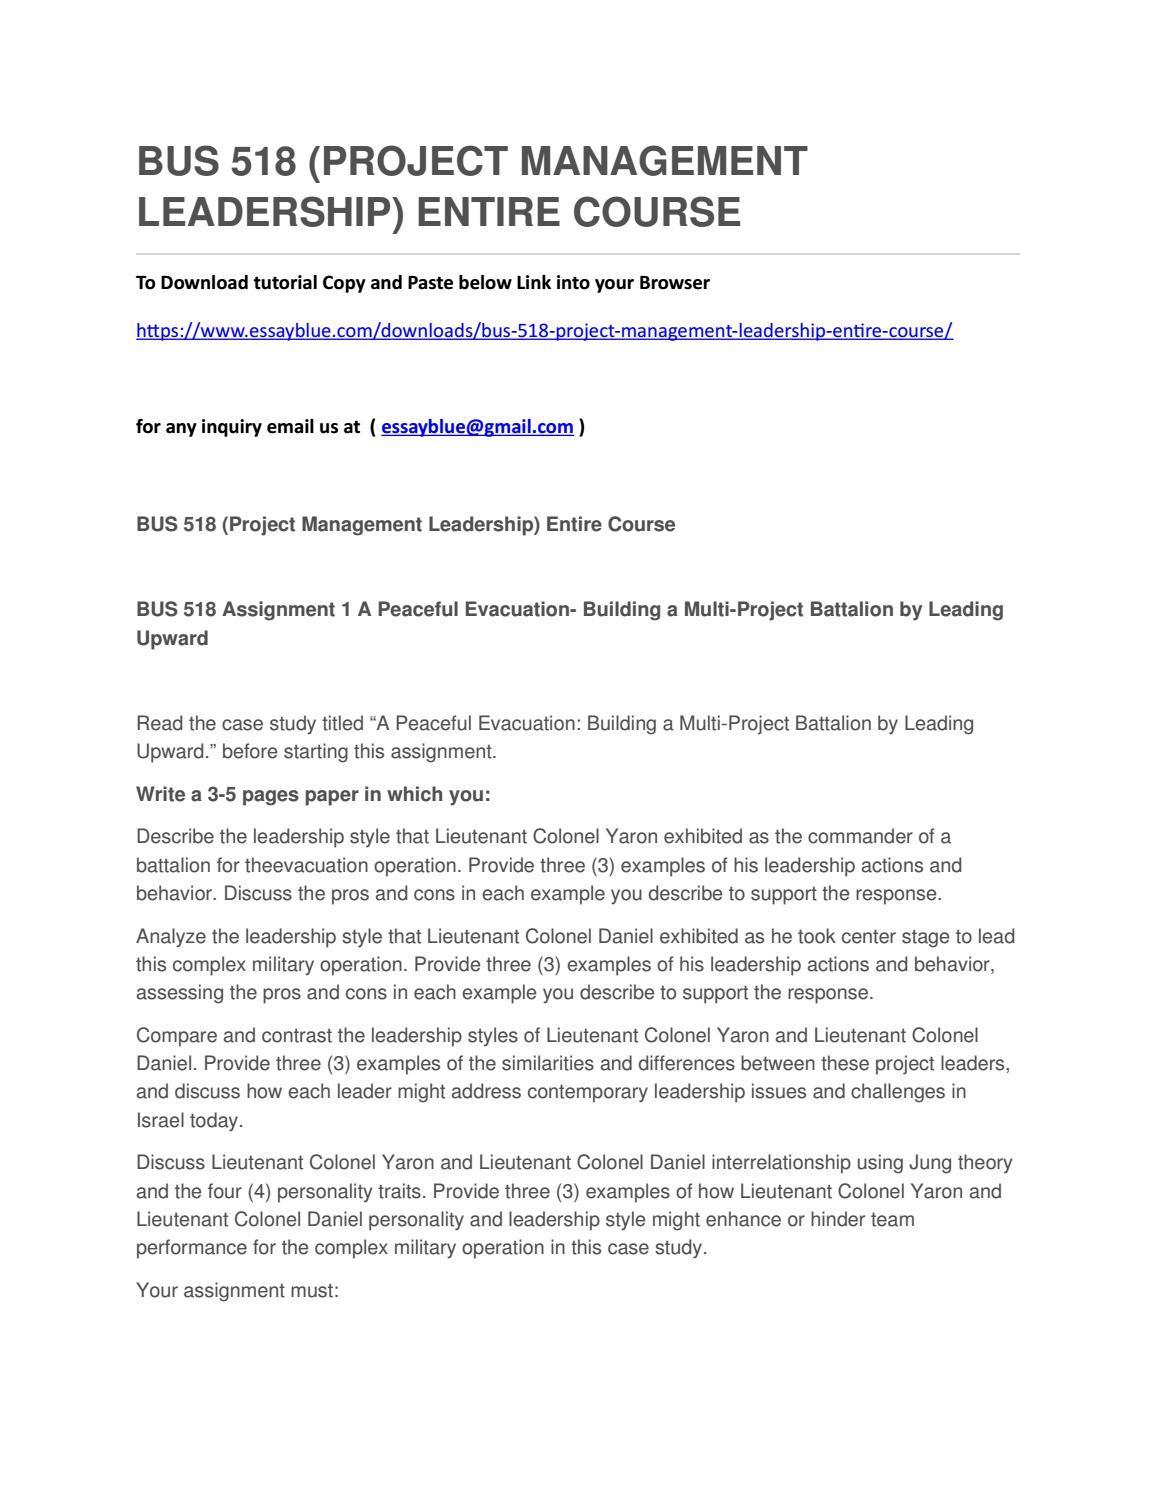 how to describe leadership - Monza berglauf-verband com